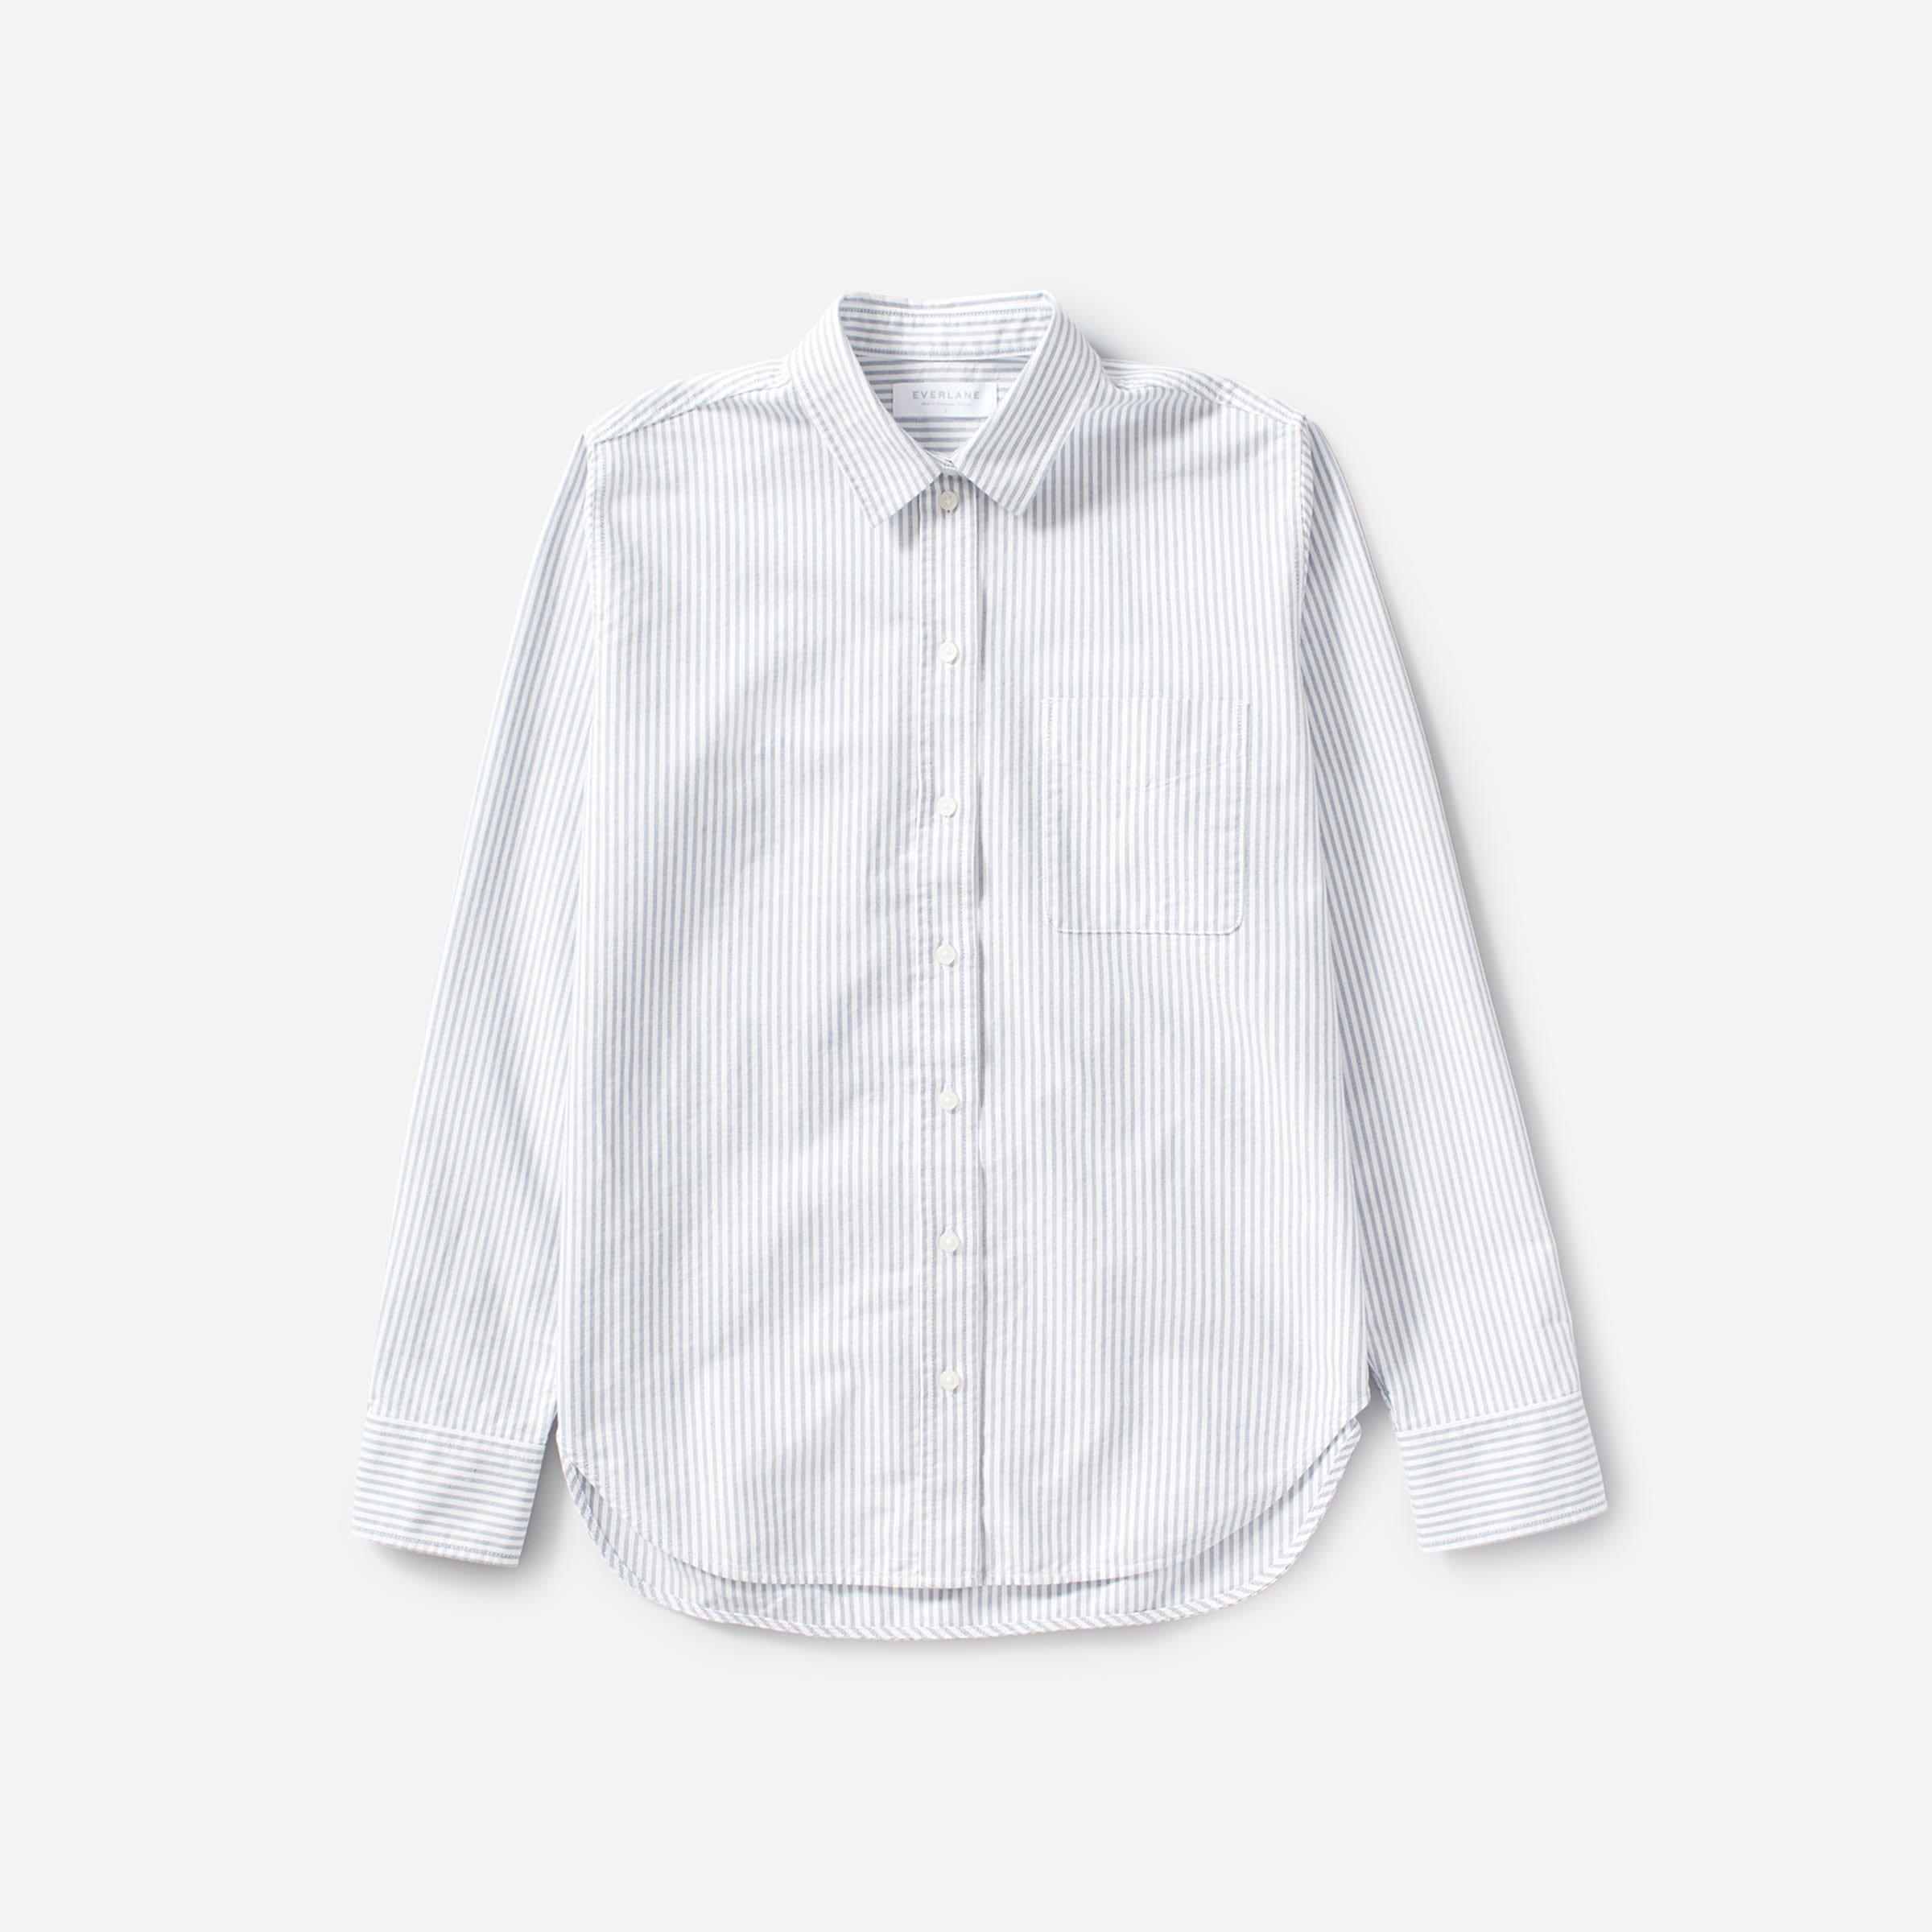 Women's Japanese Oxford Shirt | Everlane